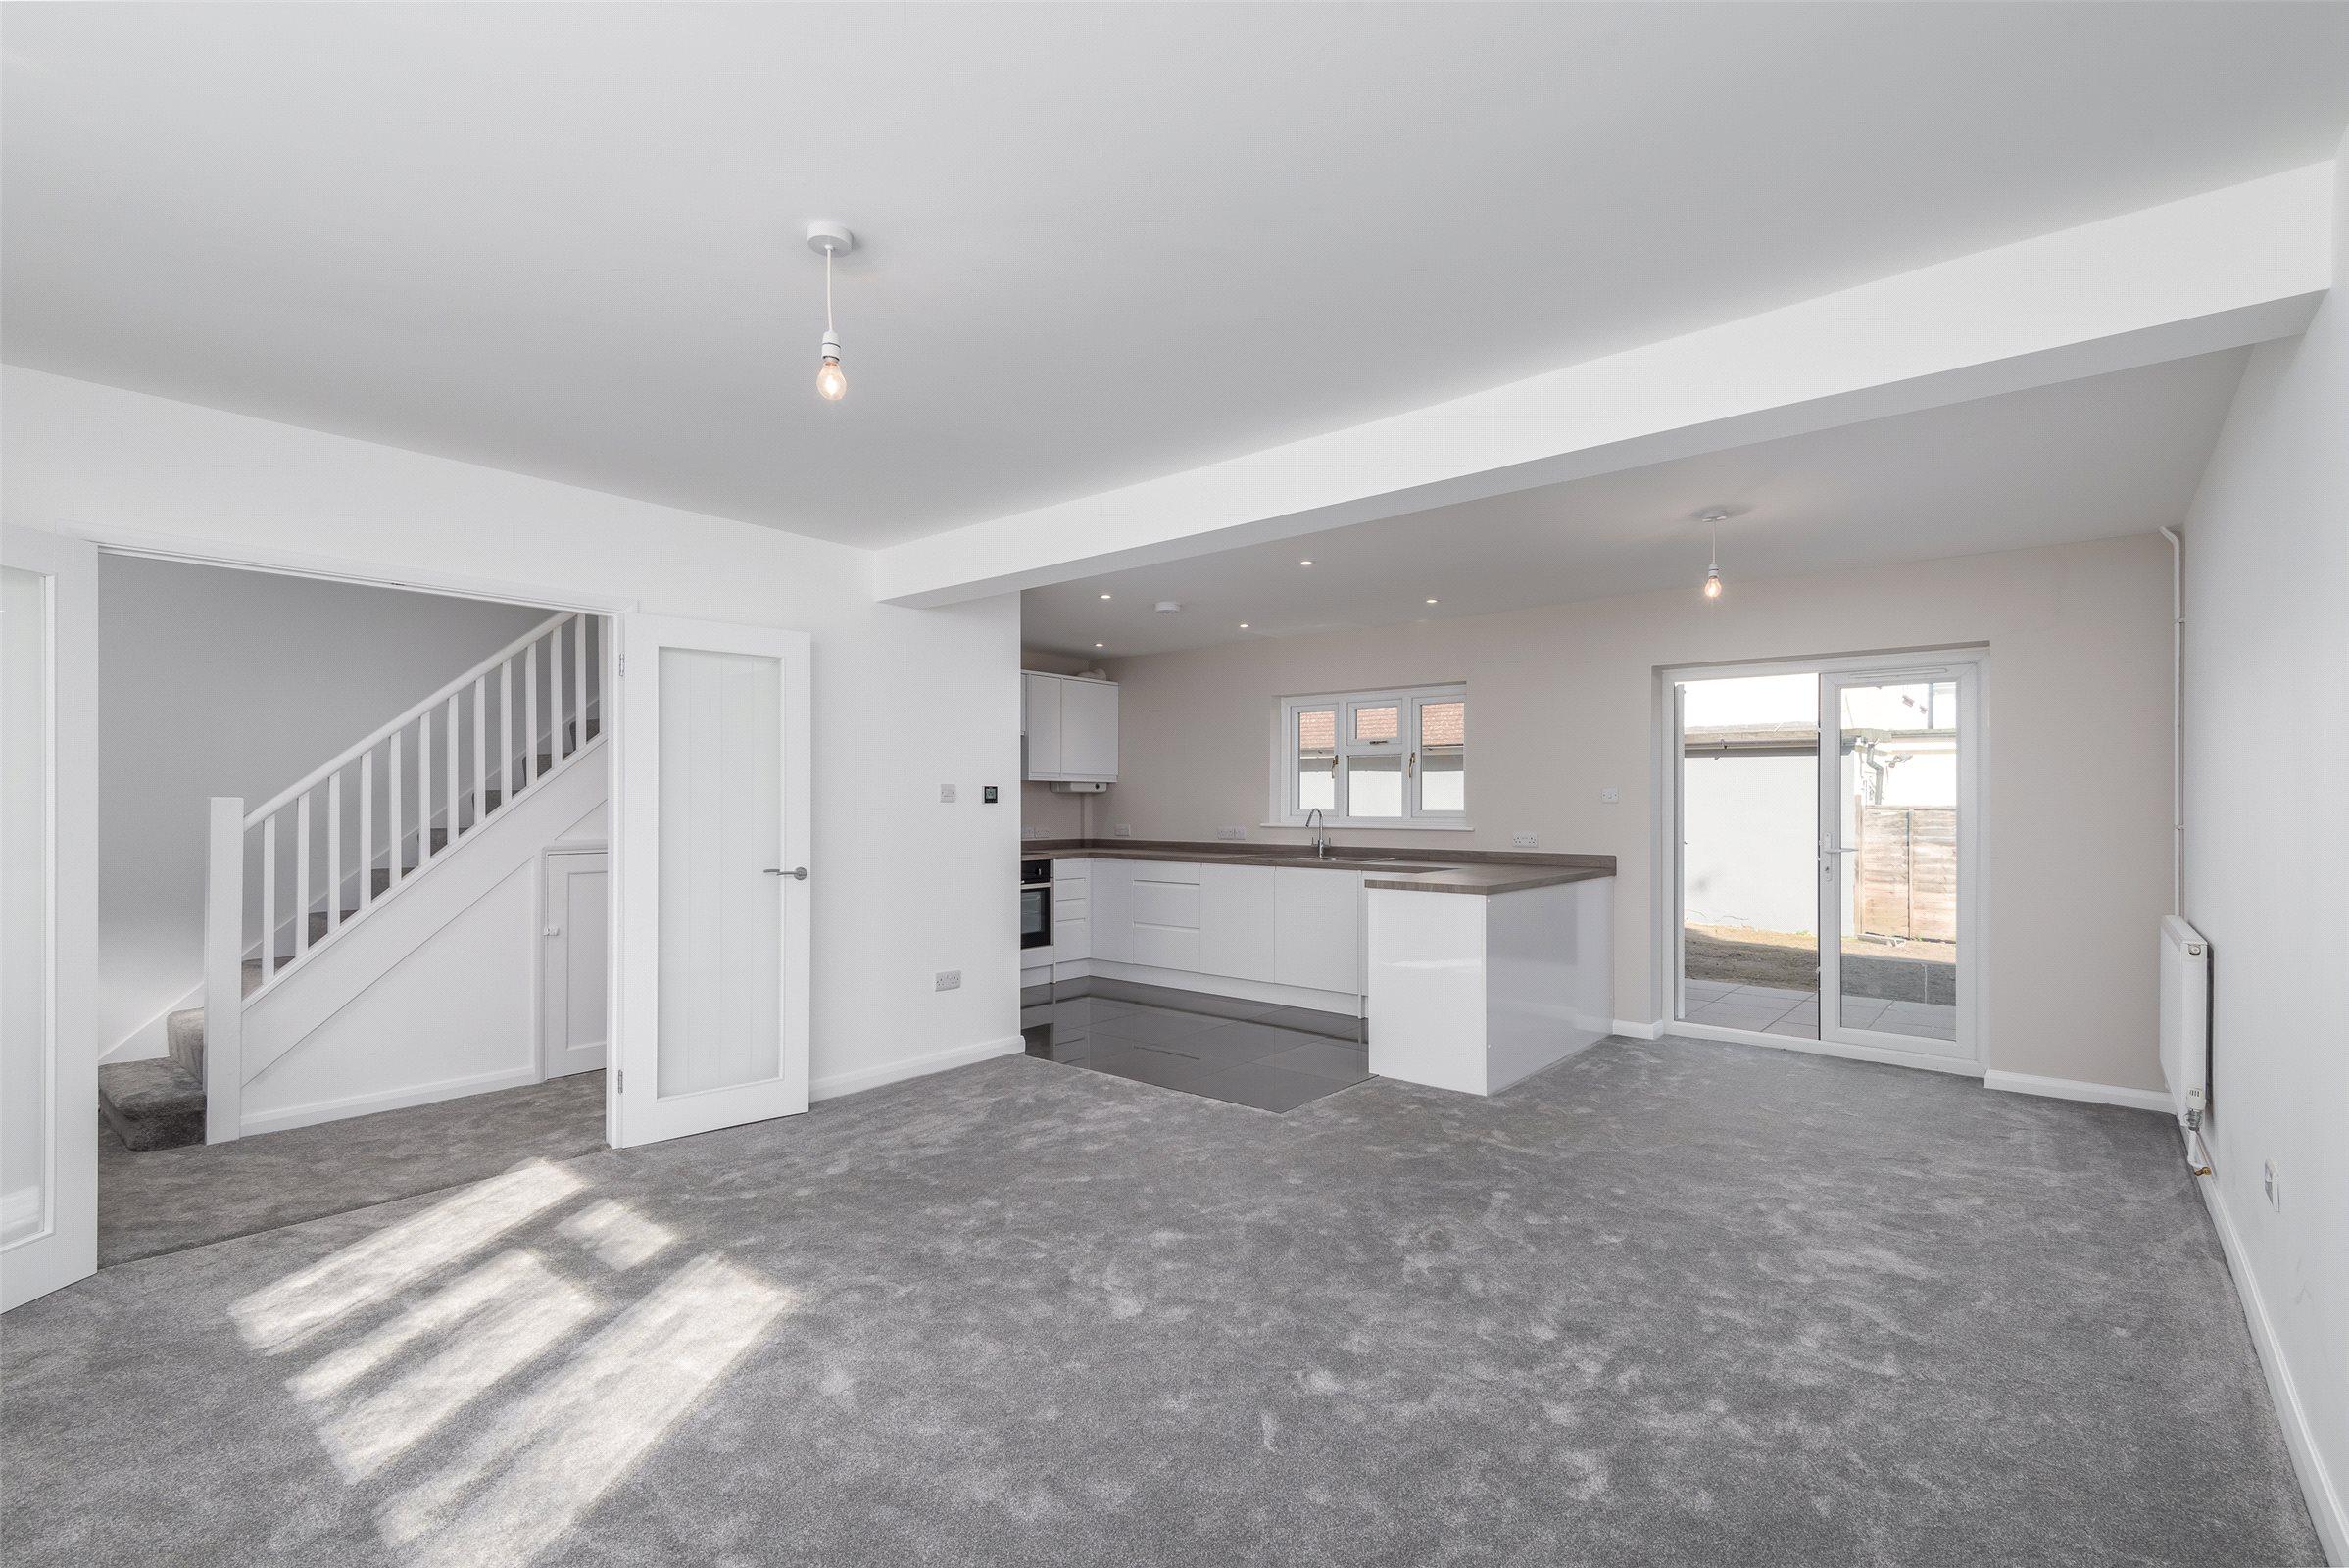 3 Bedroom Property For Sale In Brighton Road Salfords Redhill Rh1 399950